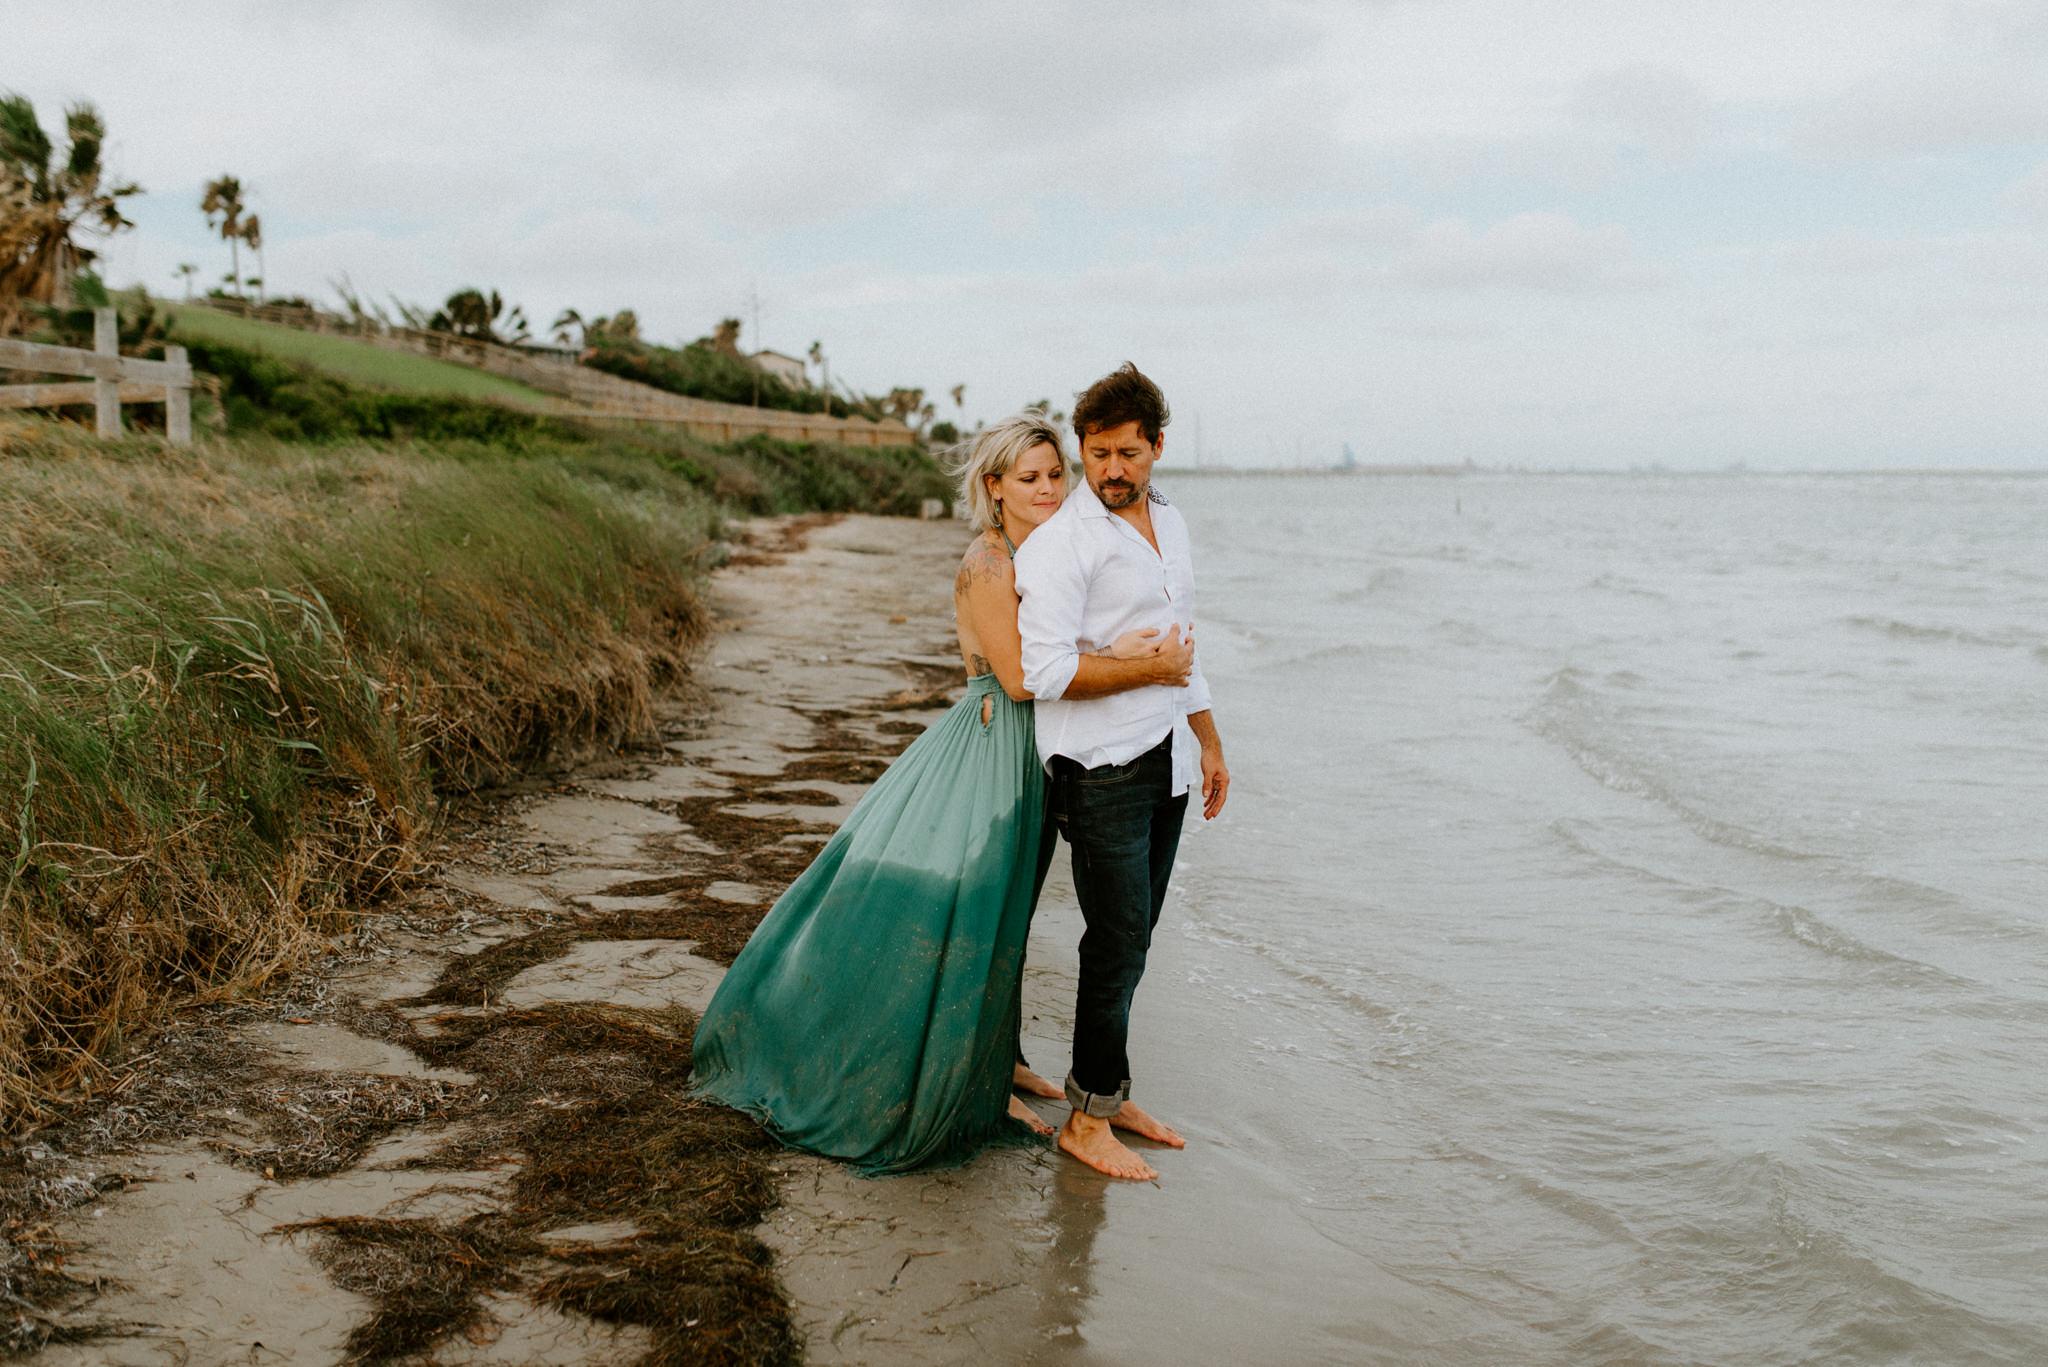 Corpus-Christi-Family-Photographer-Kerlyn-Van-Gelder-Photography98.jpg